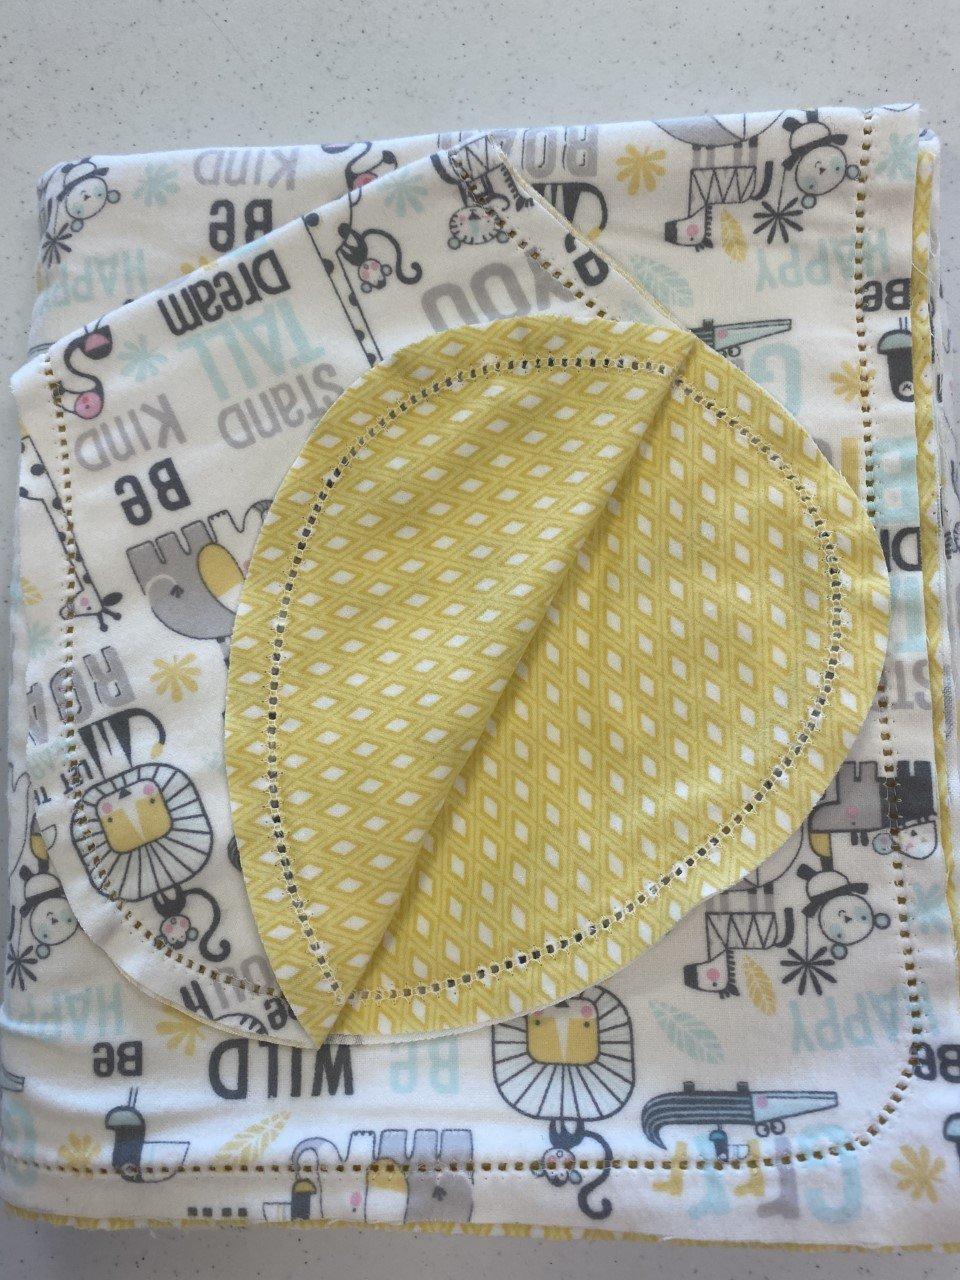 Set Blanket 36 & Burp - Snuggle Animals white